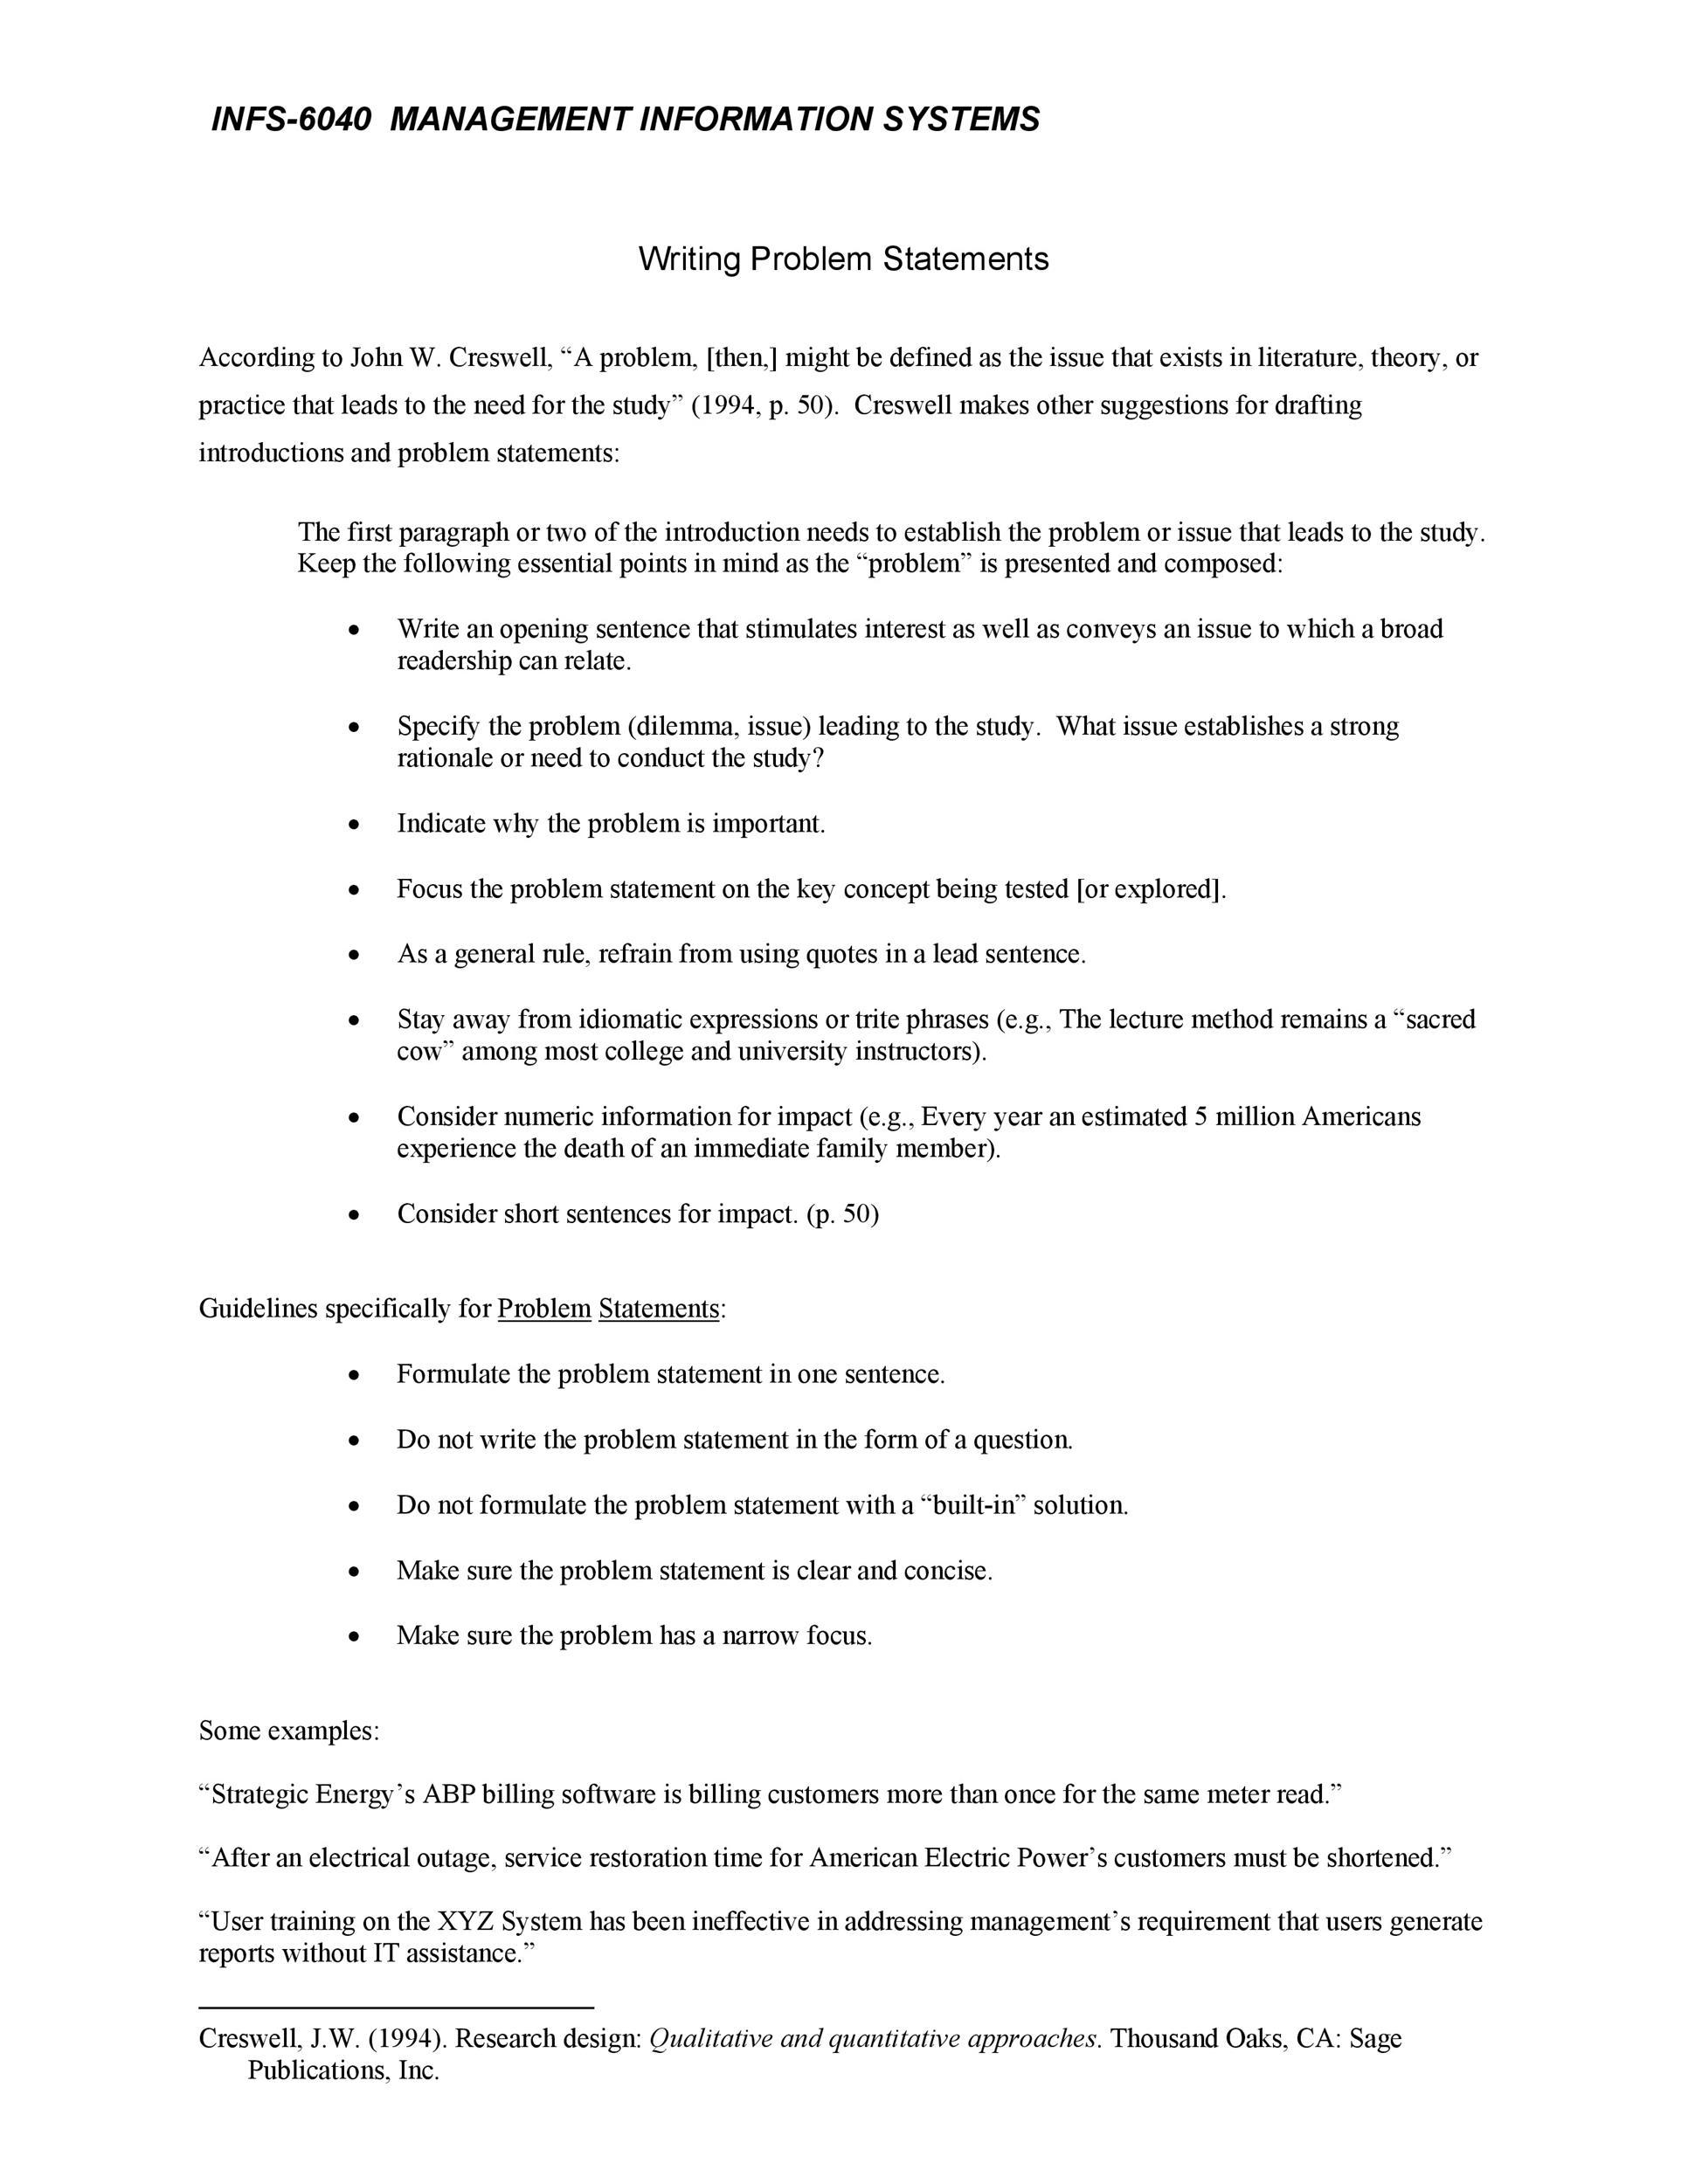 Free Problem Statement Template 14